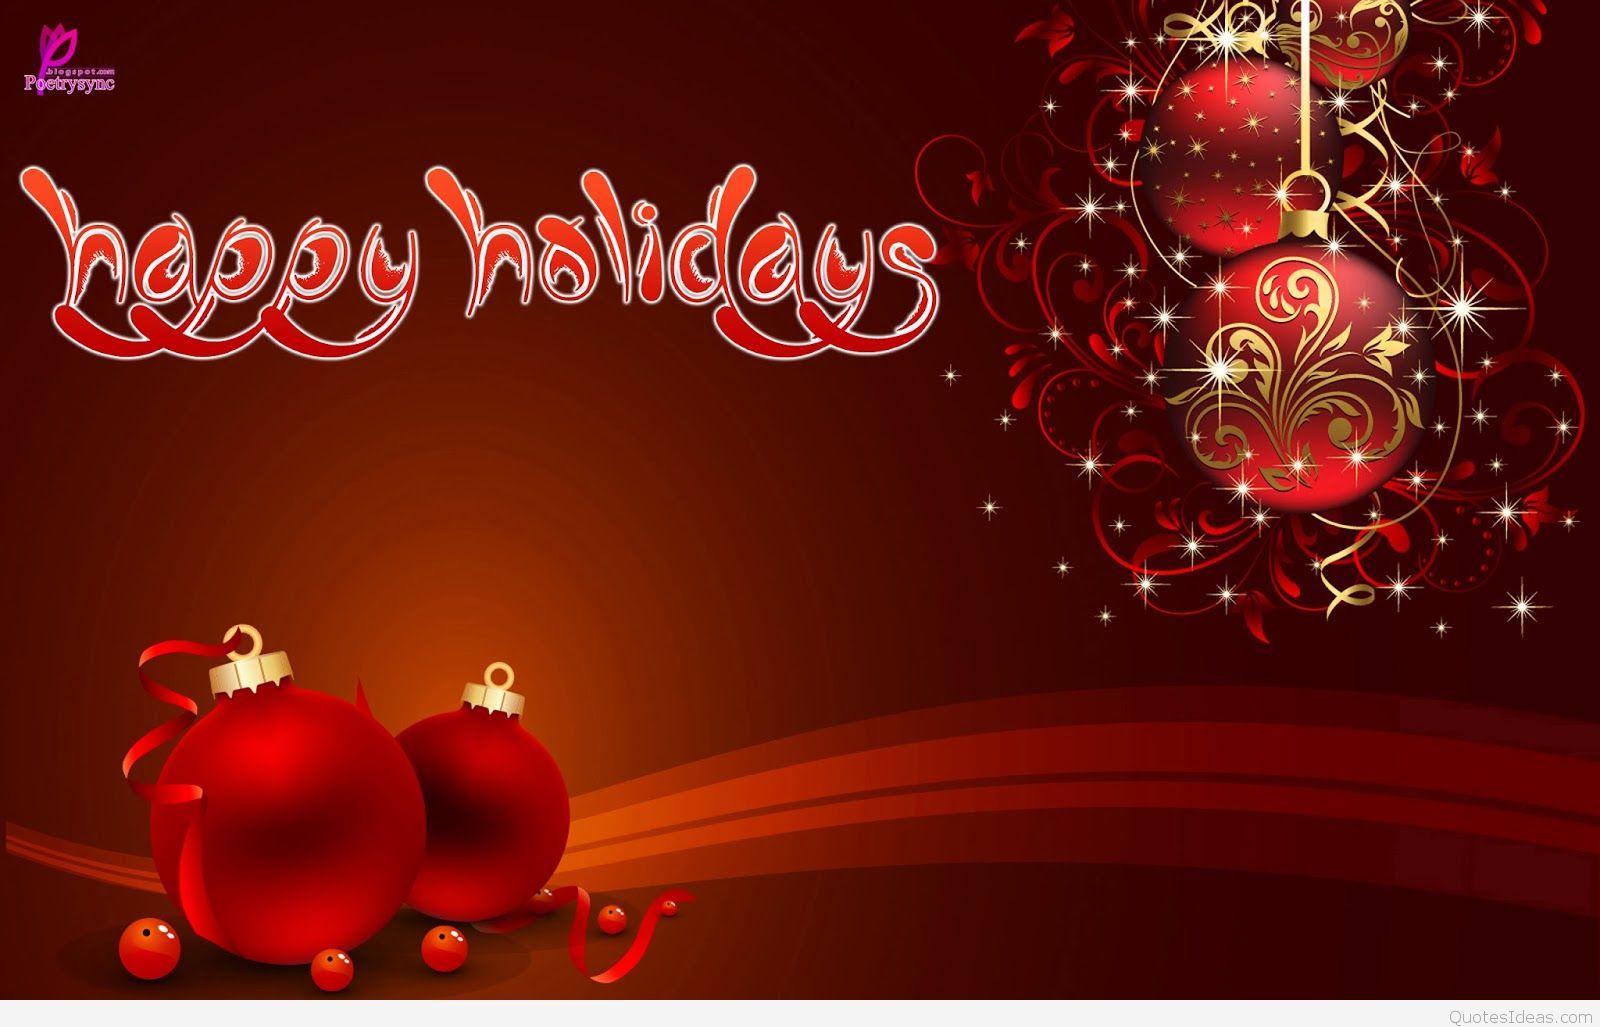 Card Wallpaper Happy Holidays HD 1600x1027